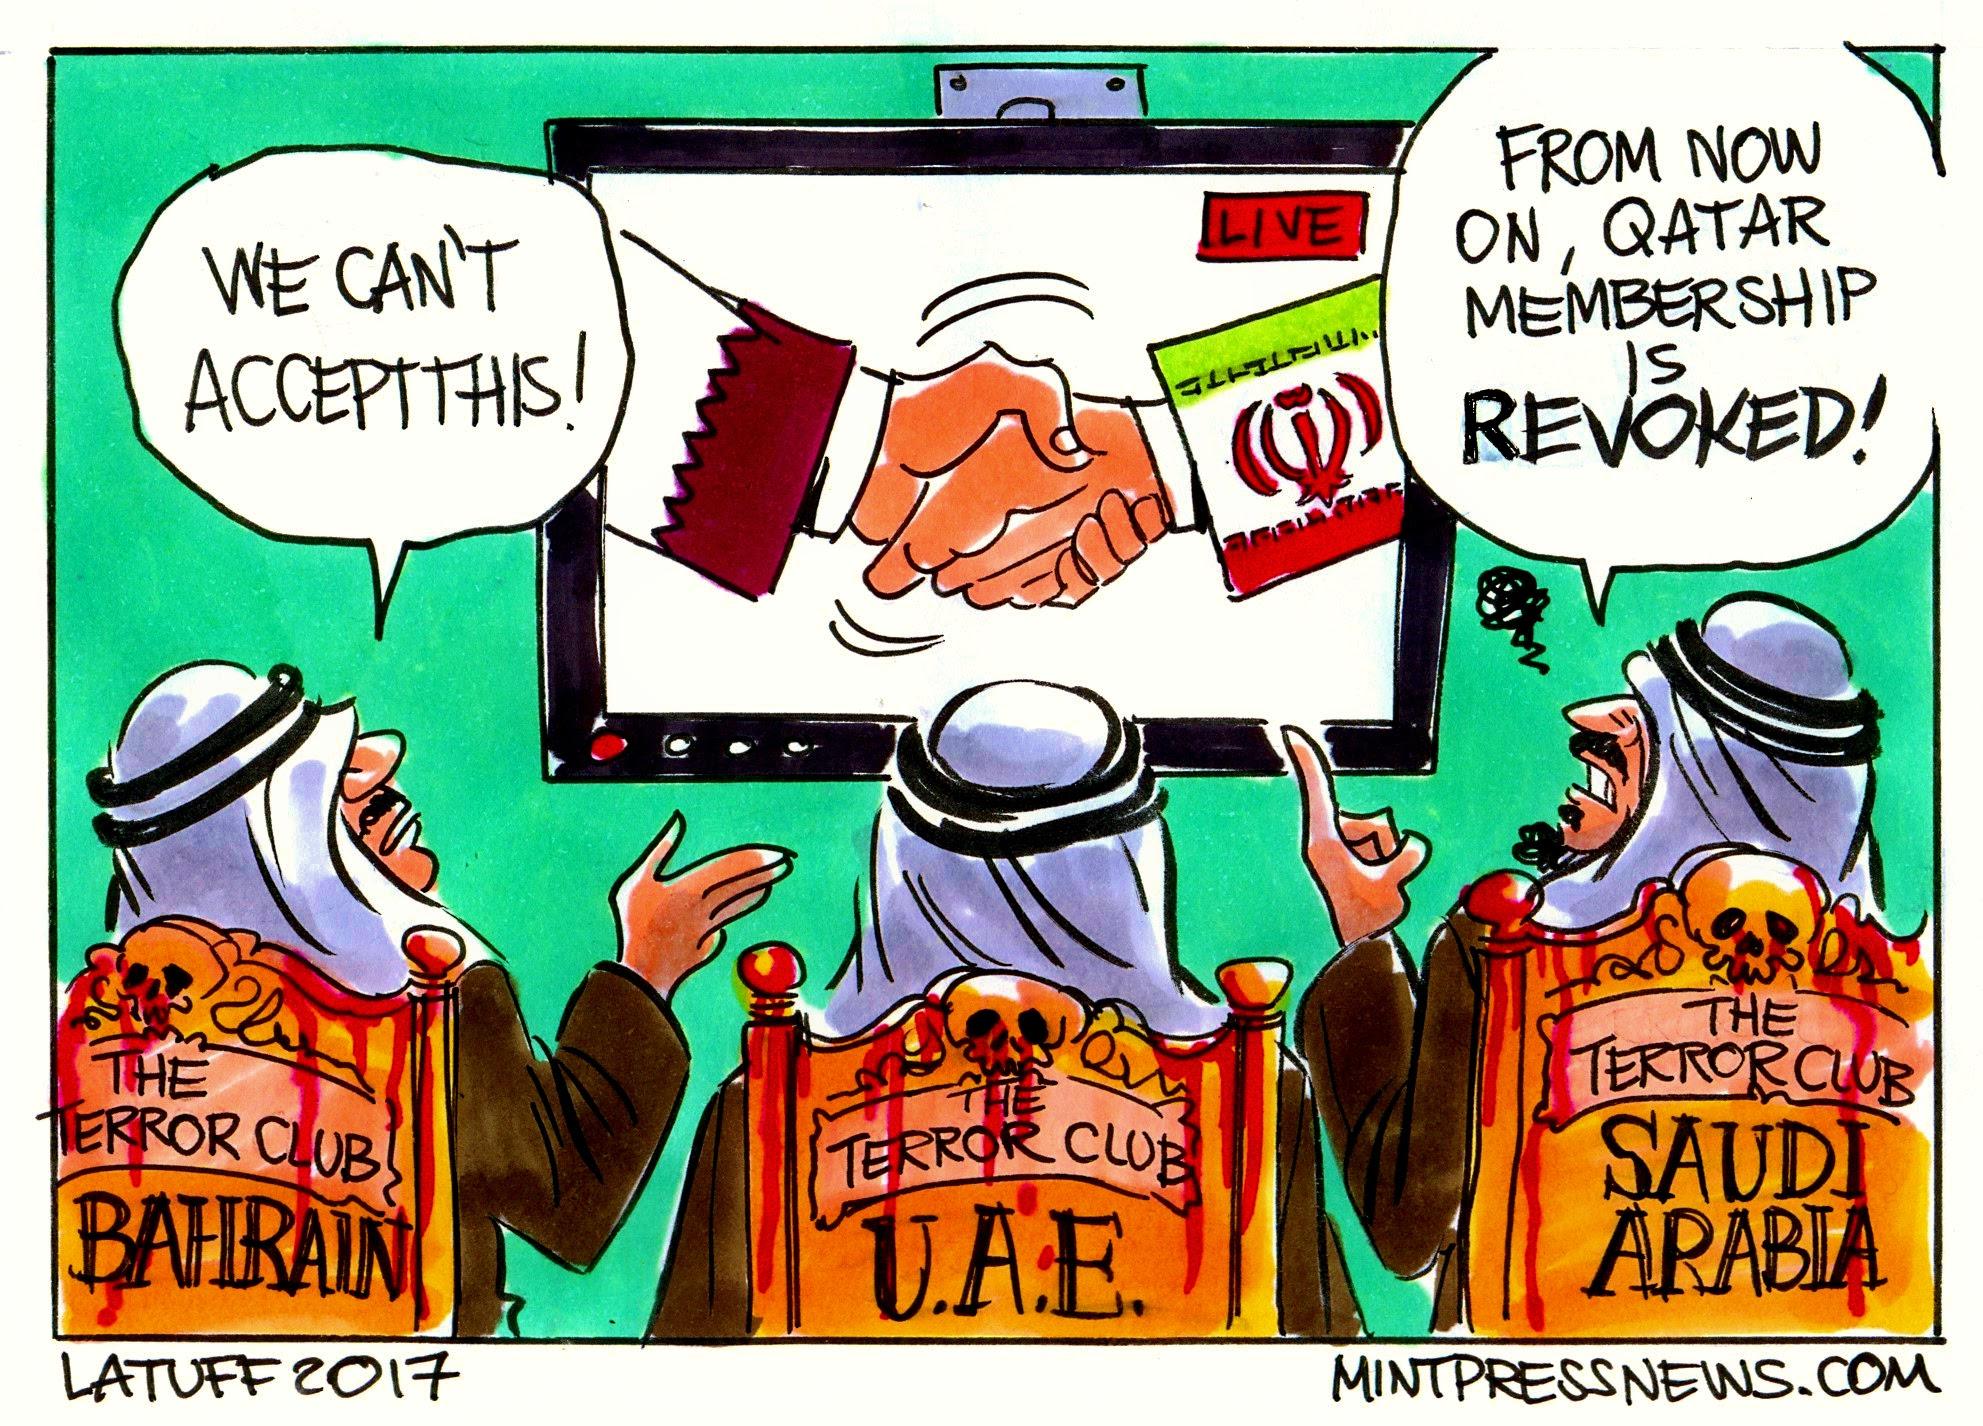 Saudi Arabia UAE Bahrain Egypt cut ties with Qatar over terrorism MintPressNews cartoon